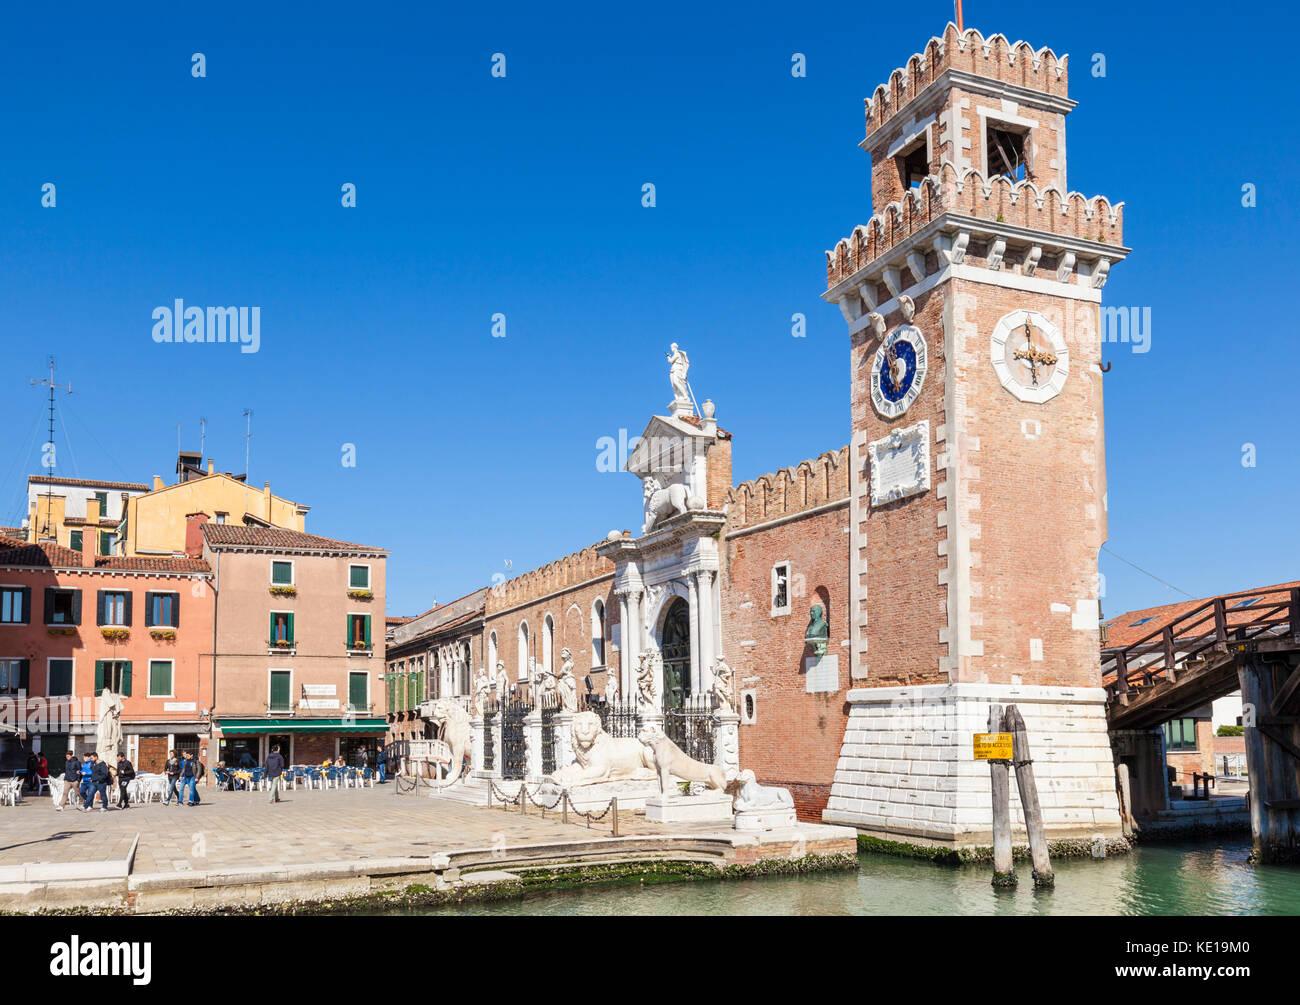 Italien Venedig Italien venezianische Arsenal Arsenale Di Venezia Ponte del Purgatorio und der Porta Magna im Venetian Stockbild